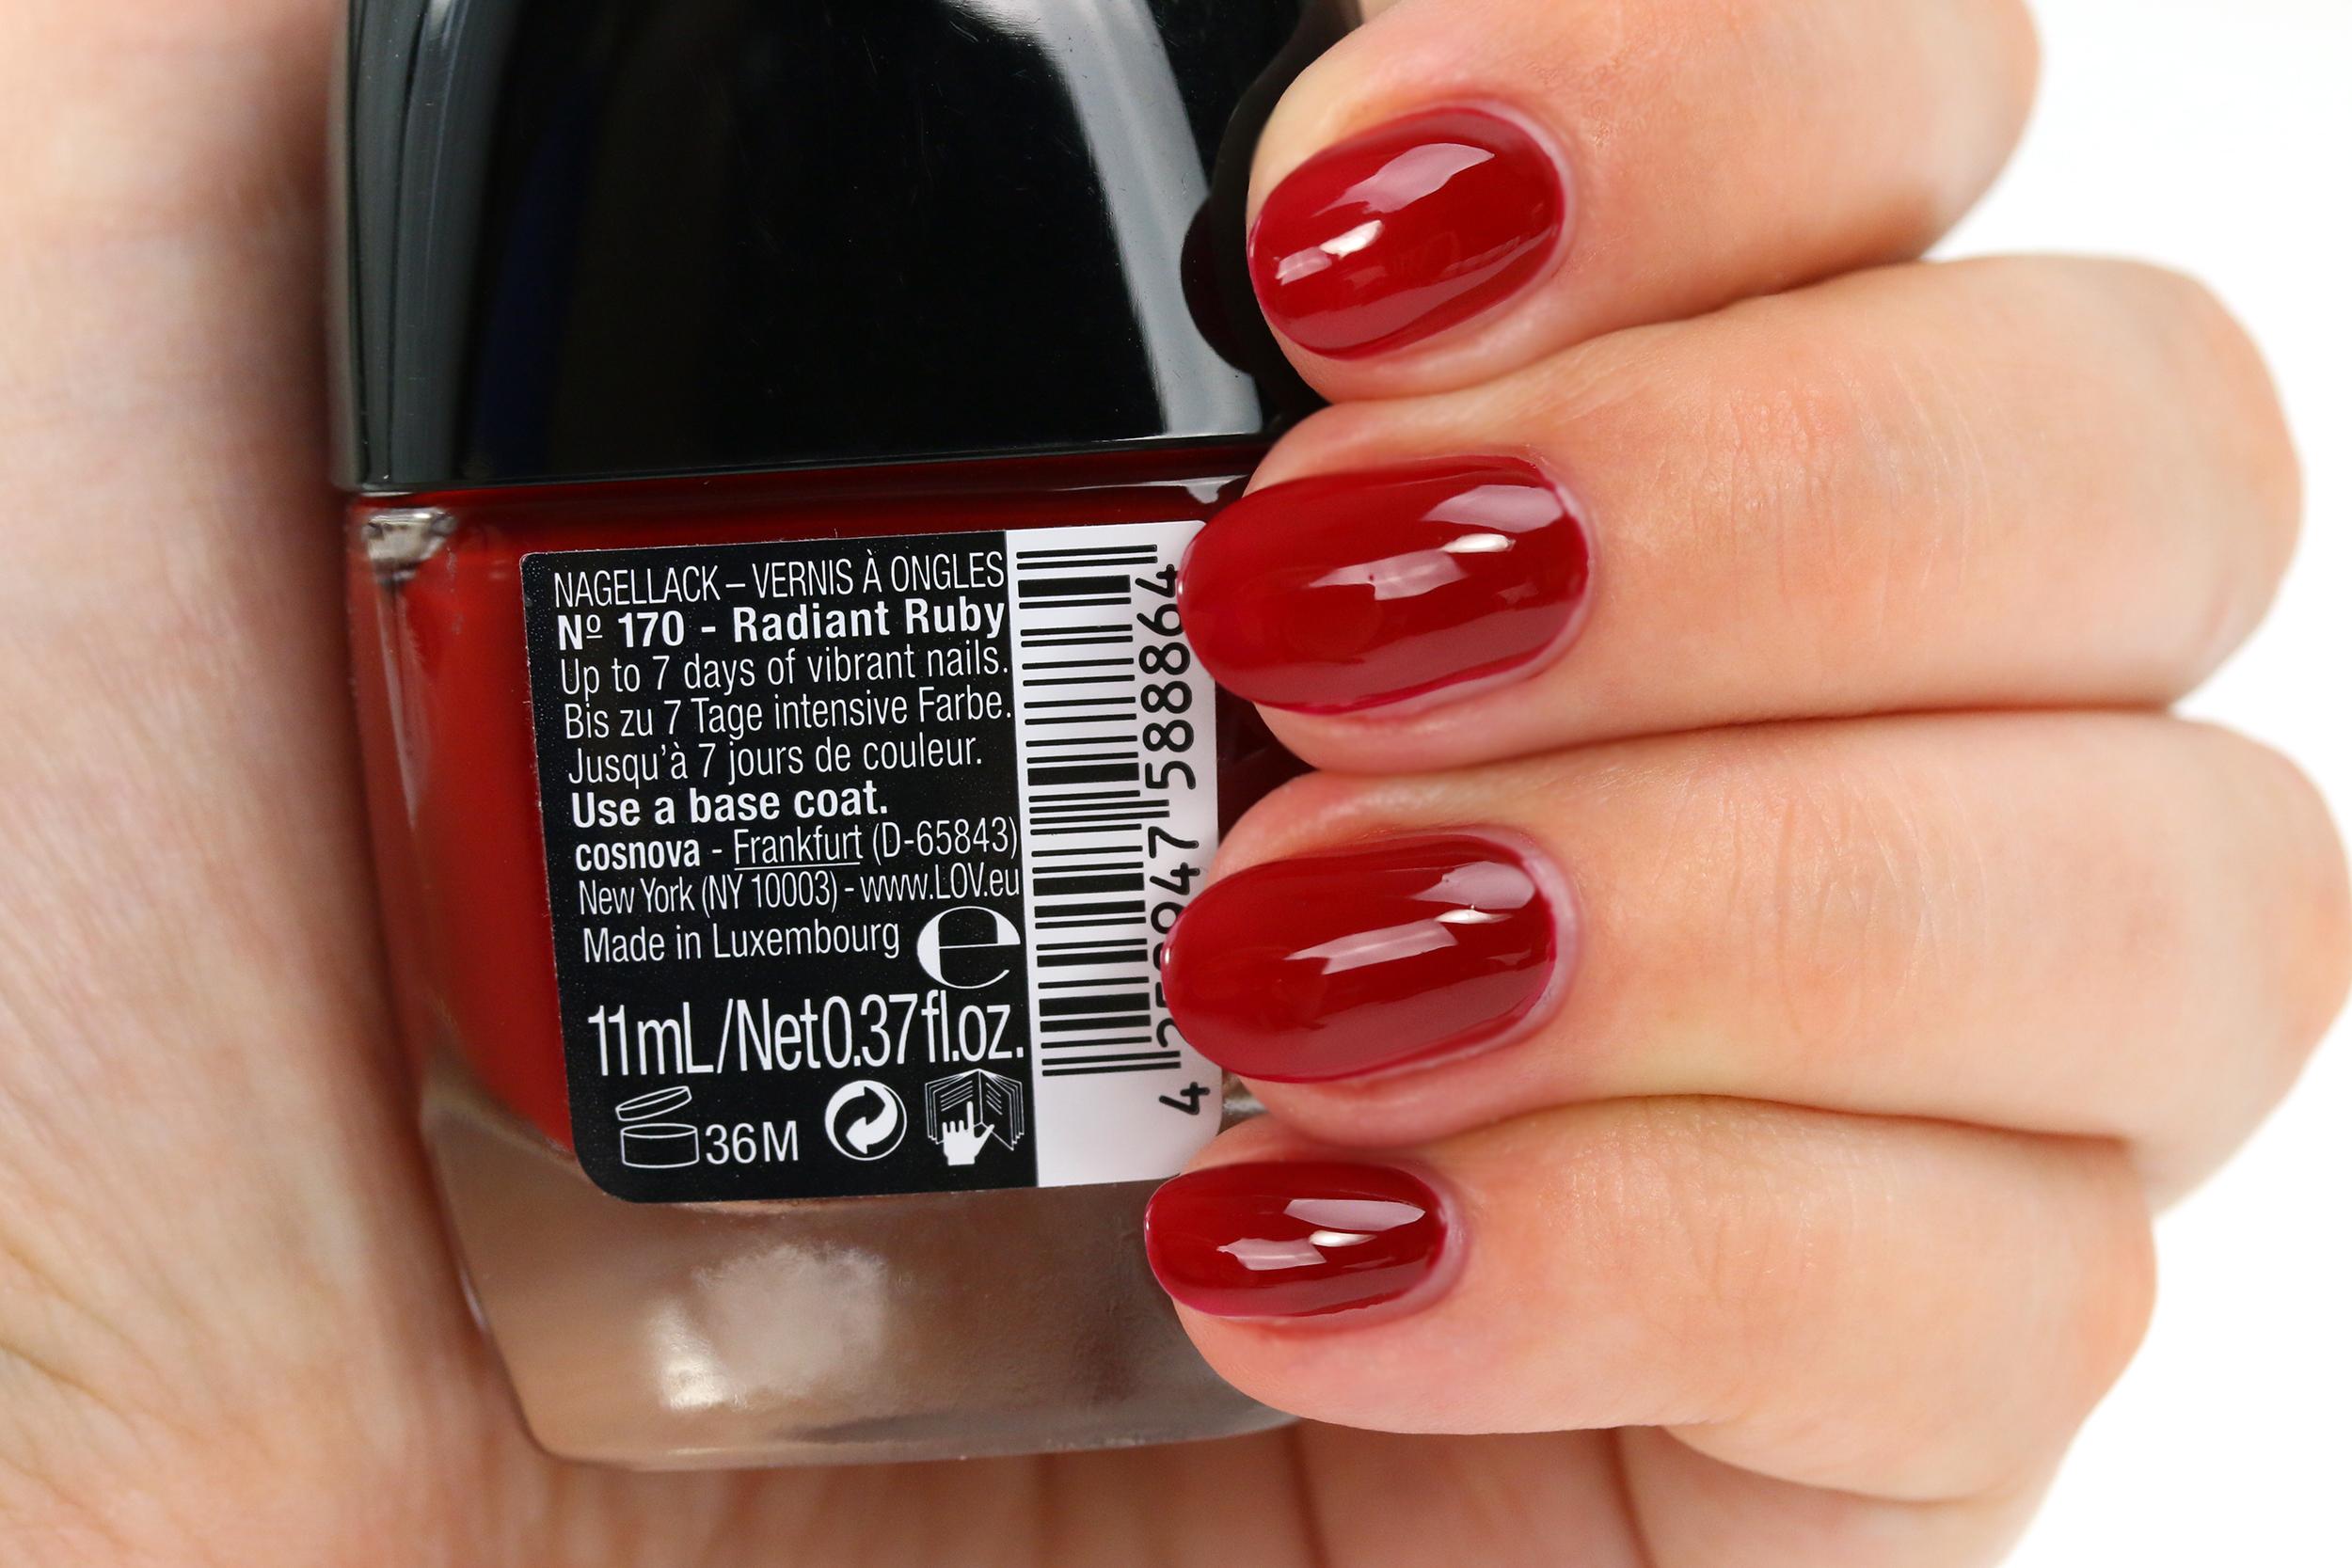 lov-nagellack-170-radiant-ruby